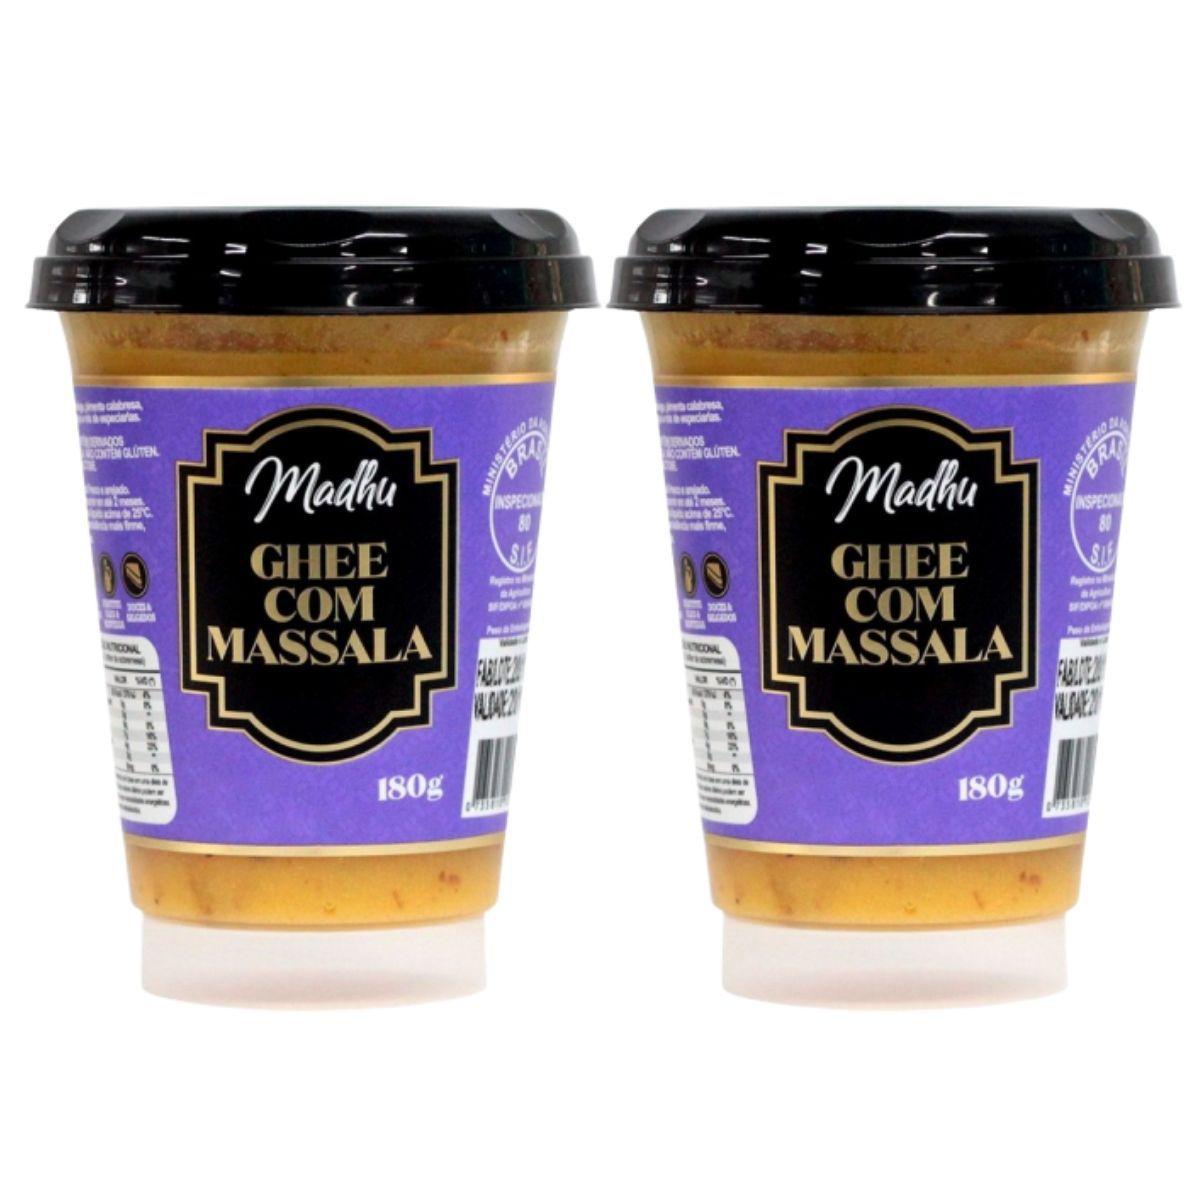 Kit 2 Manteigas Ghee C/ Massala Clarificada 180g - Madhu Bakery